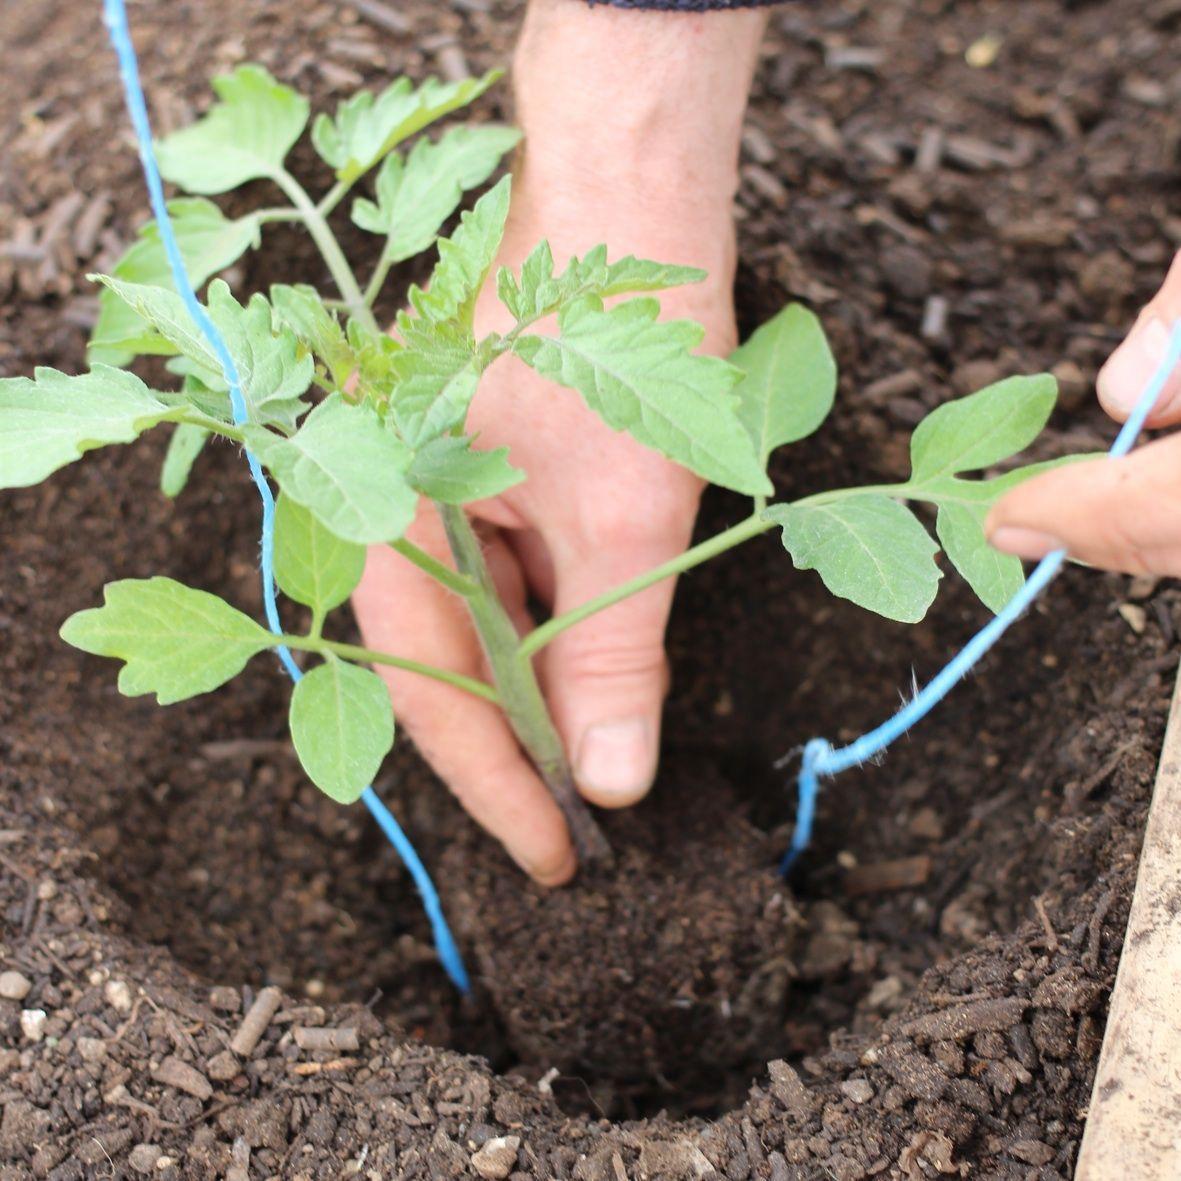 Giris Domates Tek Yillik Bir Bitkidir Yaklasik 1900 Yillarinda Adana Da Yetistirilmeye Container Gardening Vegetables Tomato Seedlings Gardening For Beginners